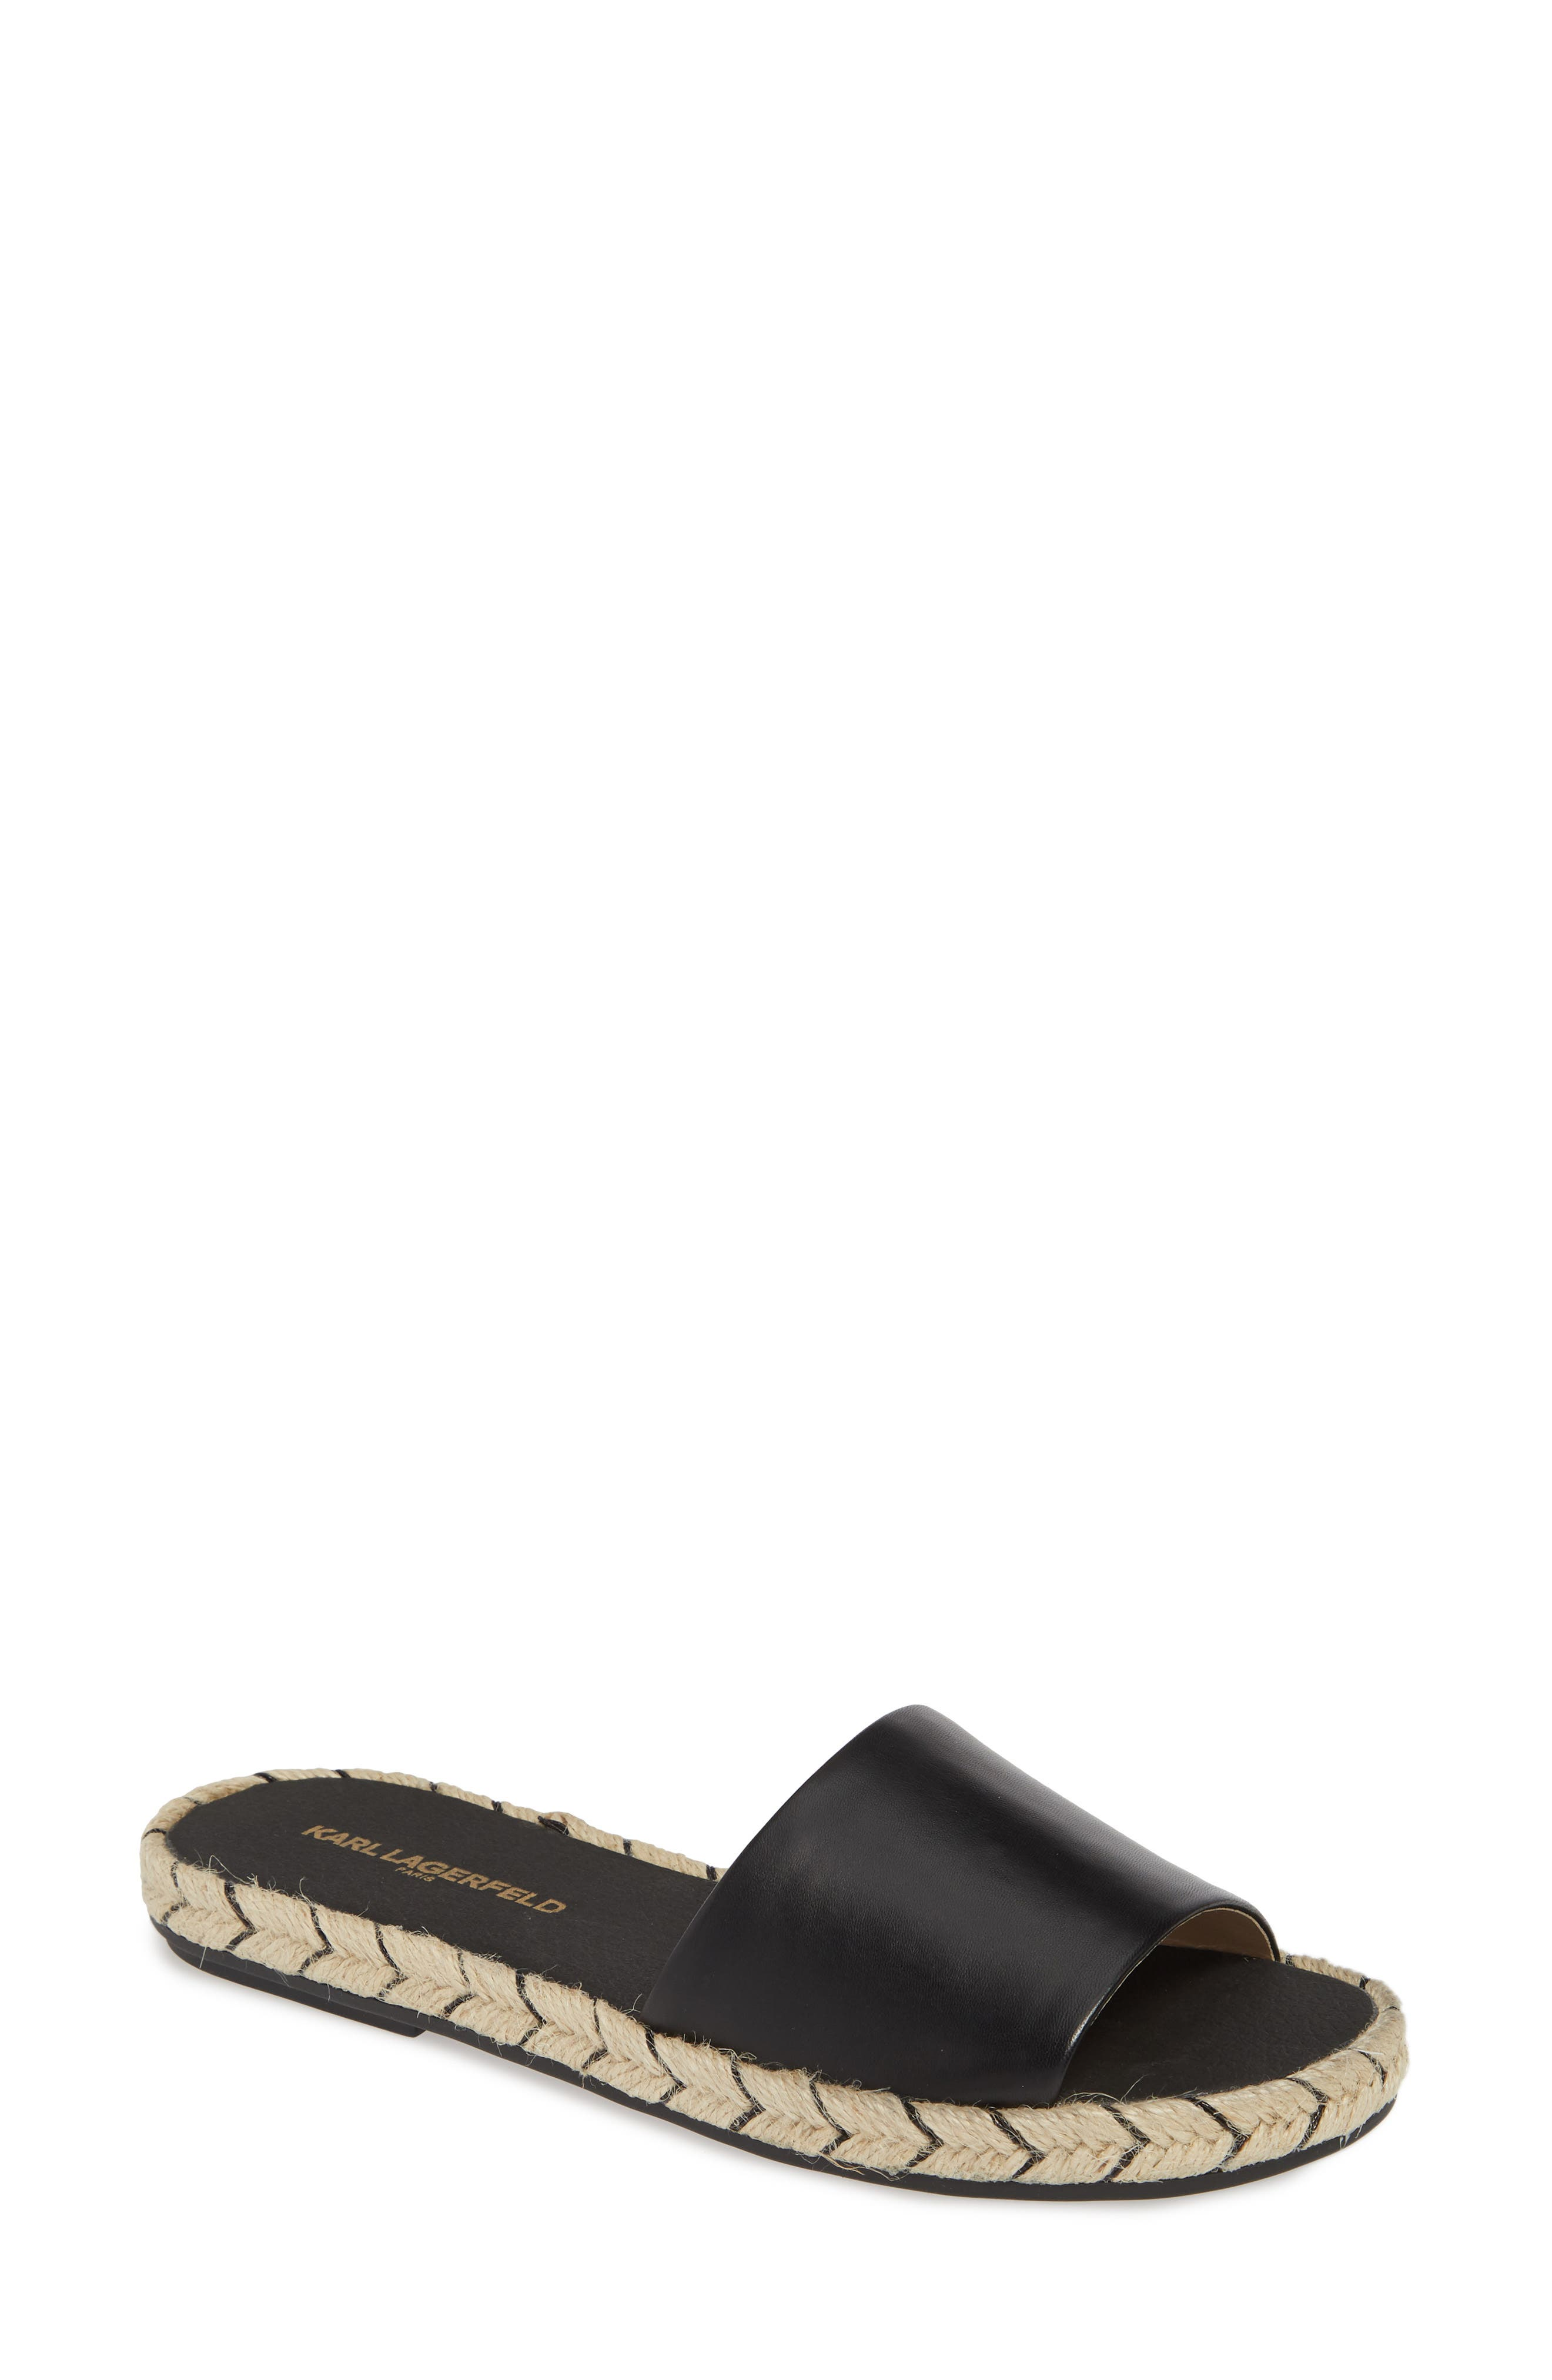 Karl Lagerfeld Paris Niya Slide Sandal- Black